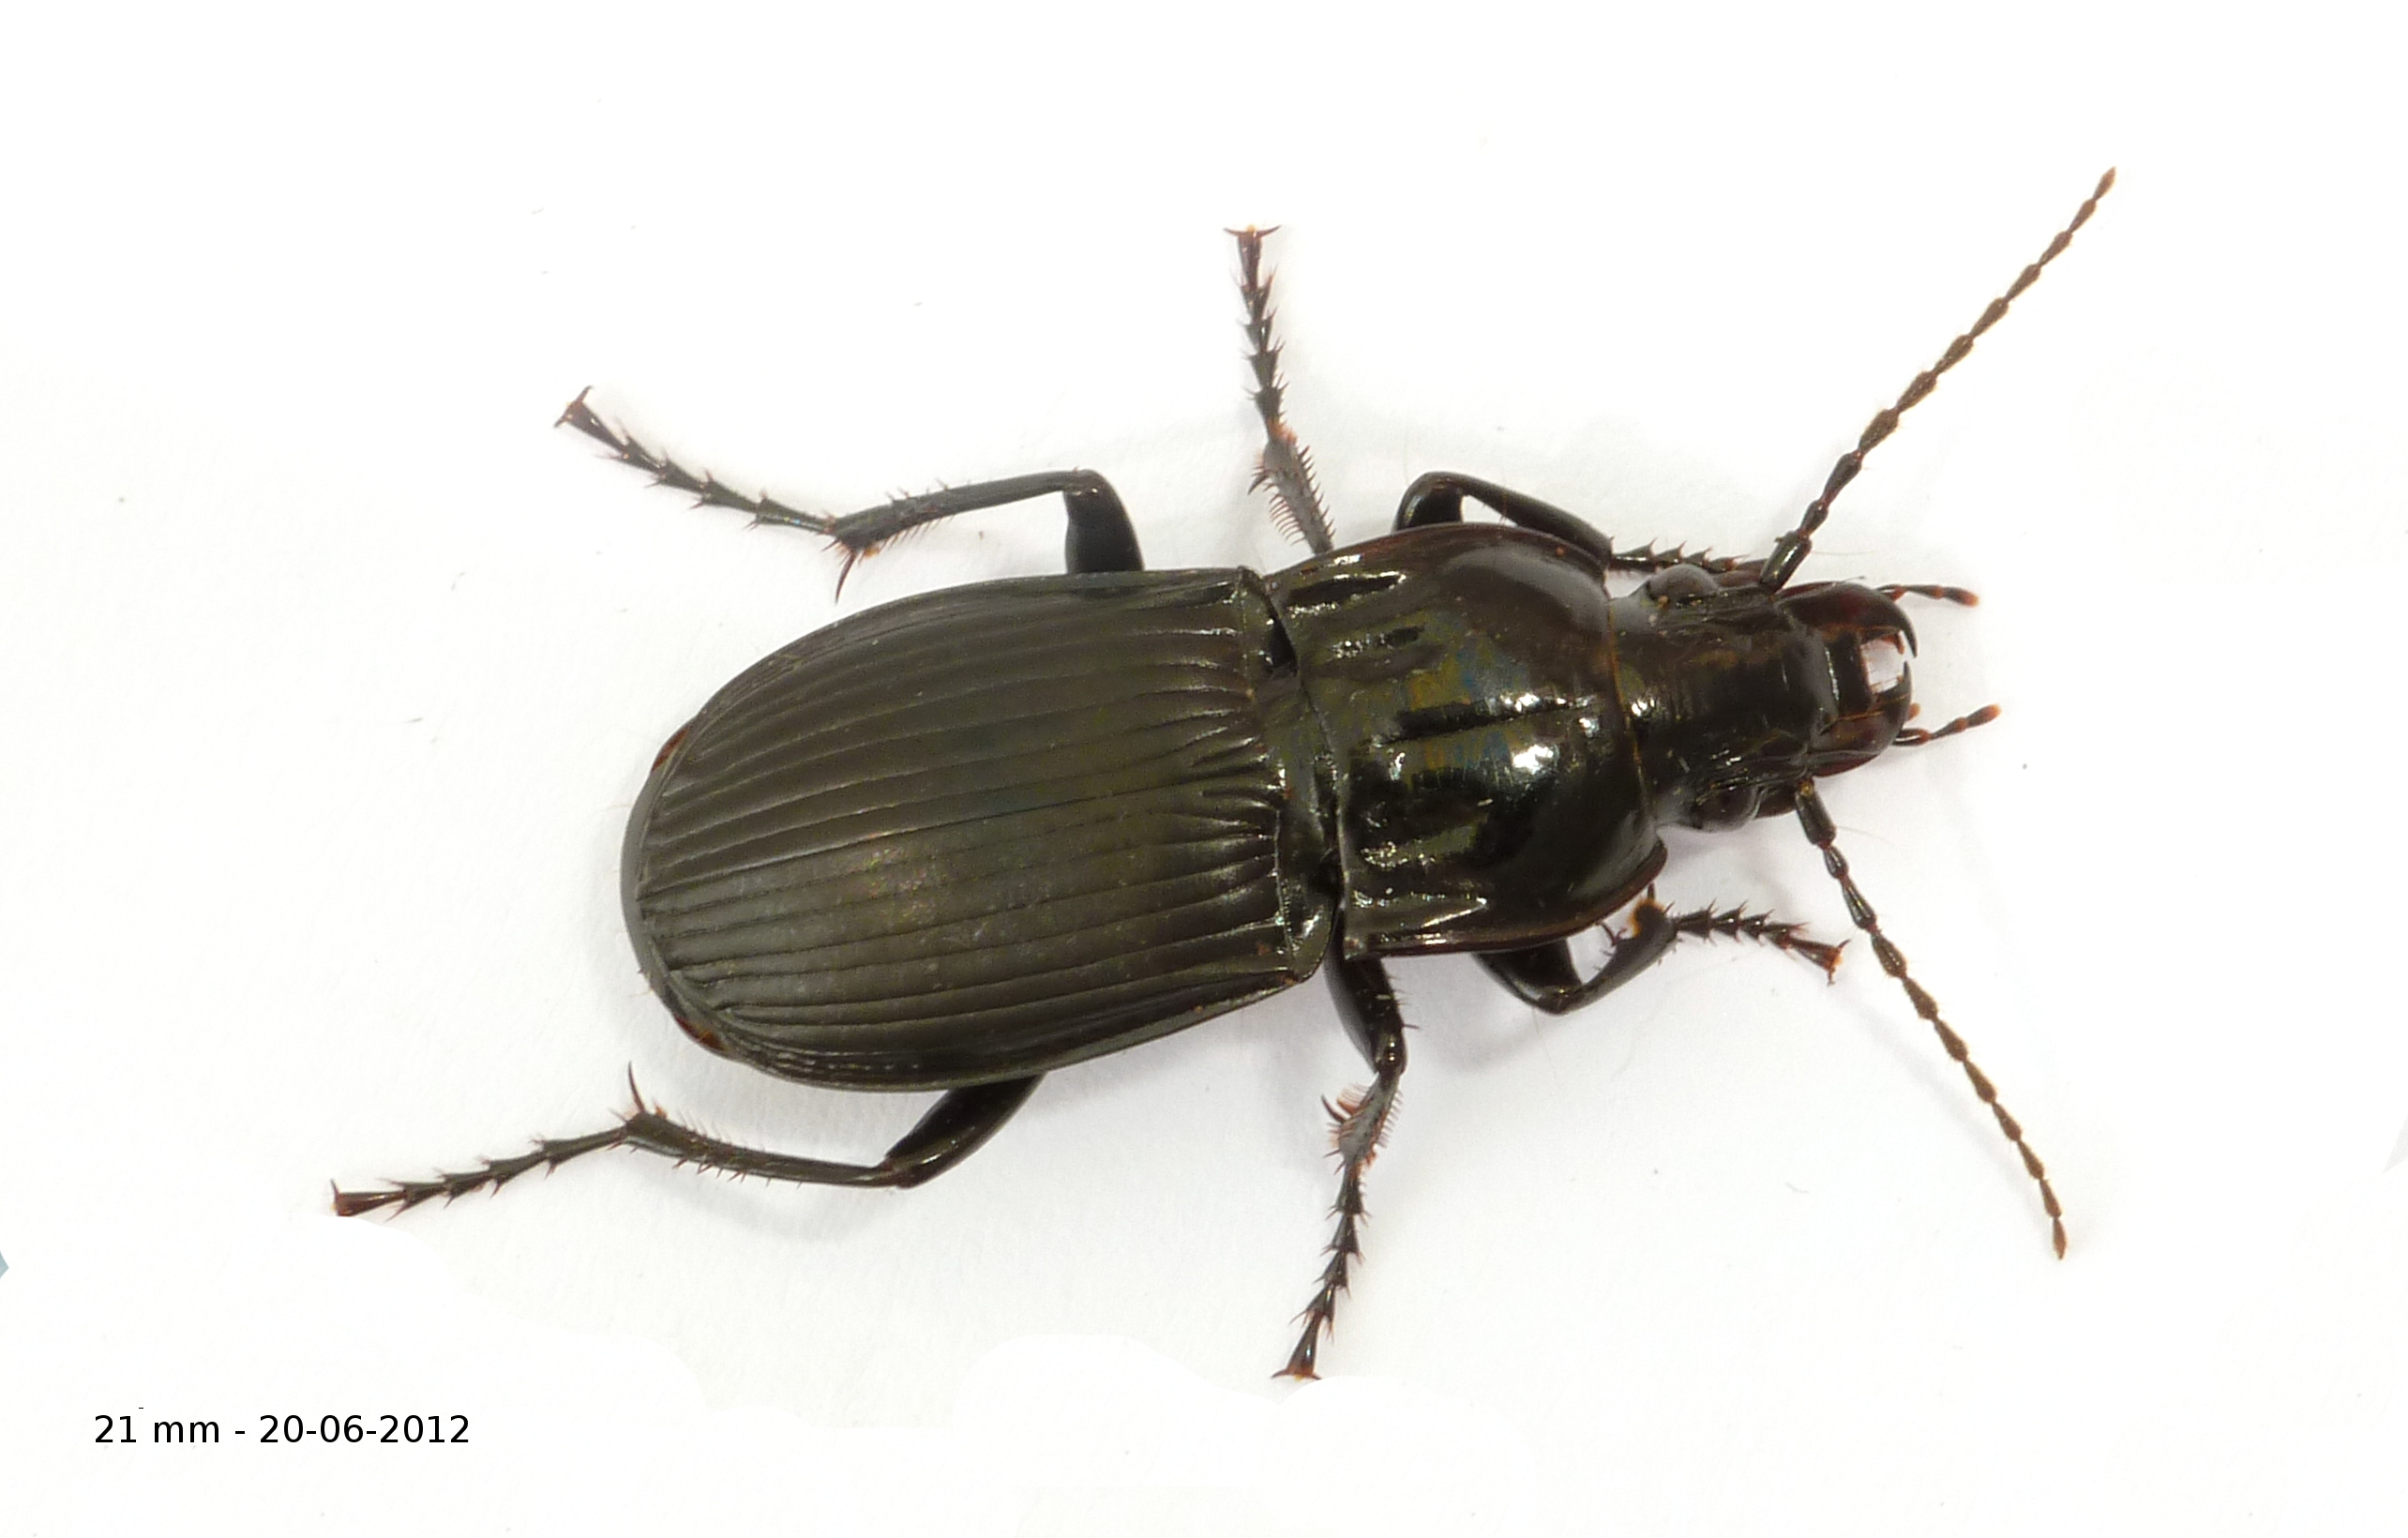 Clé d'indentification des Abax (Coleoptera, Carabidae)